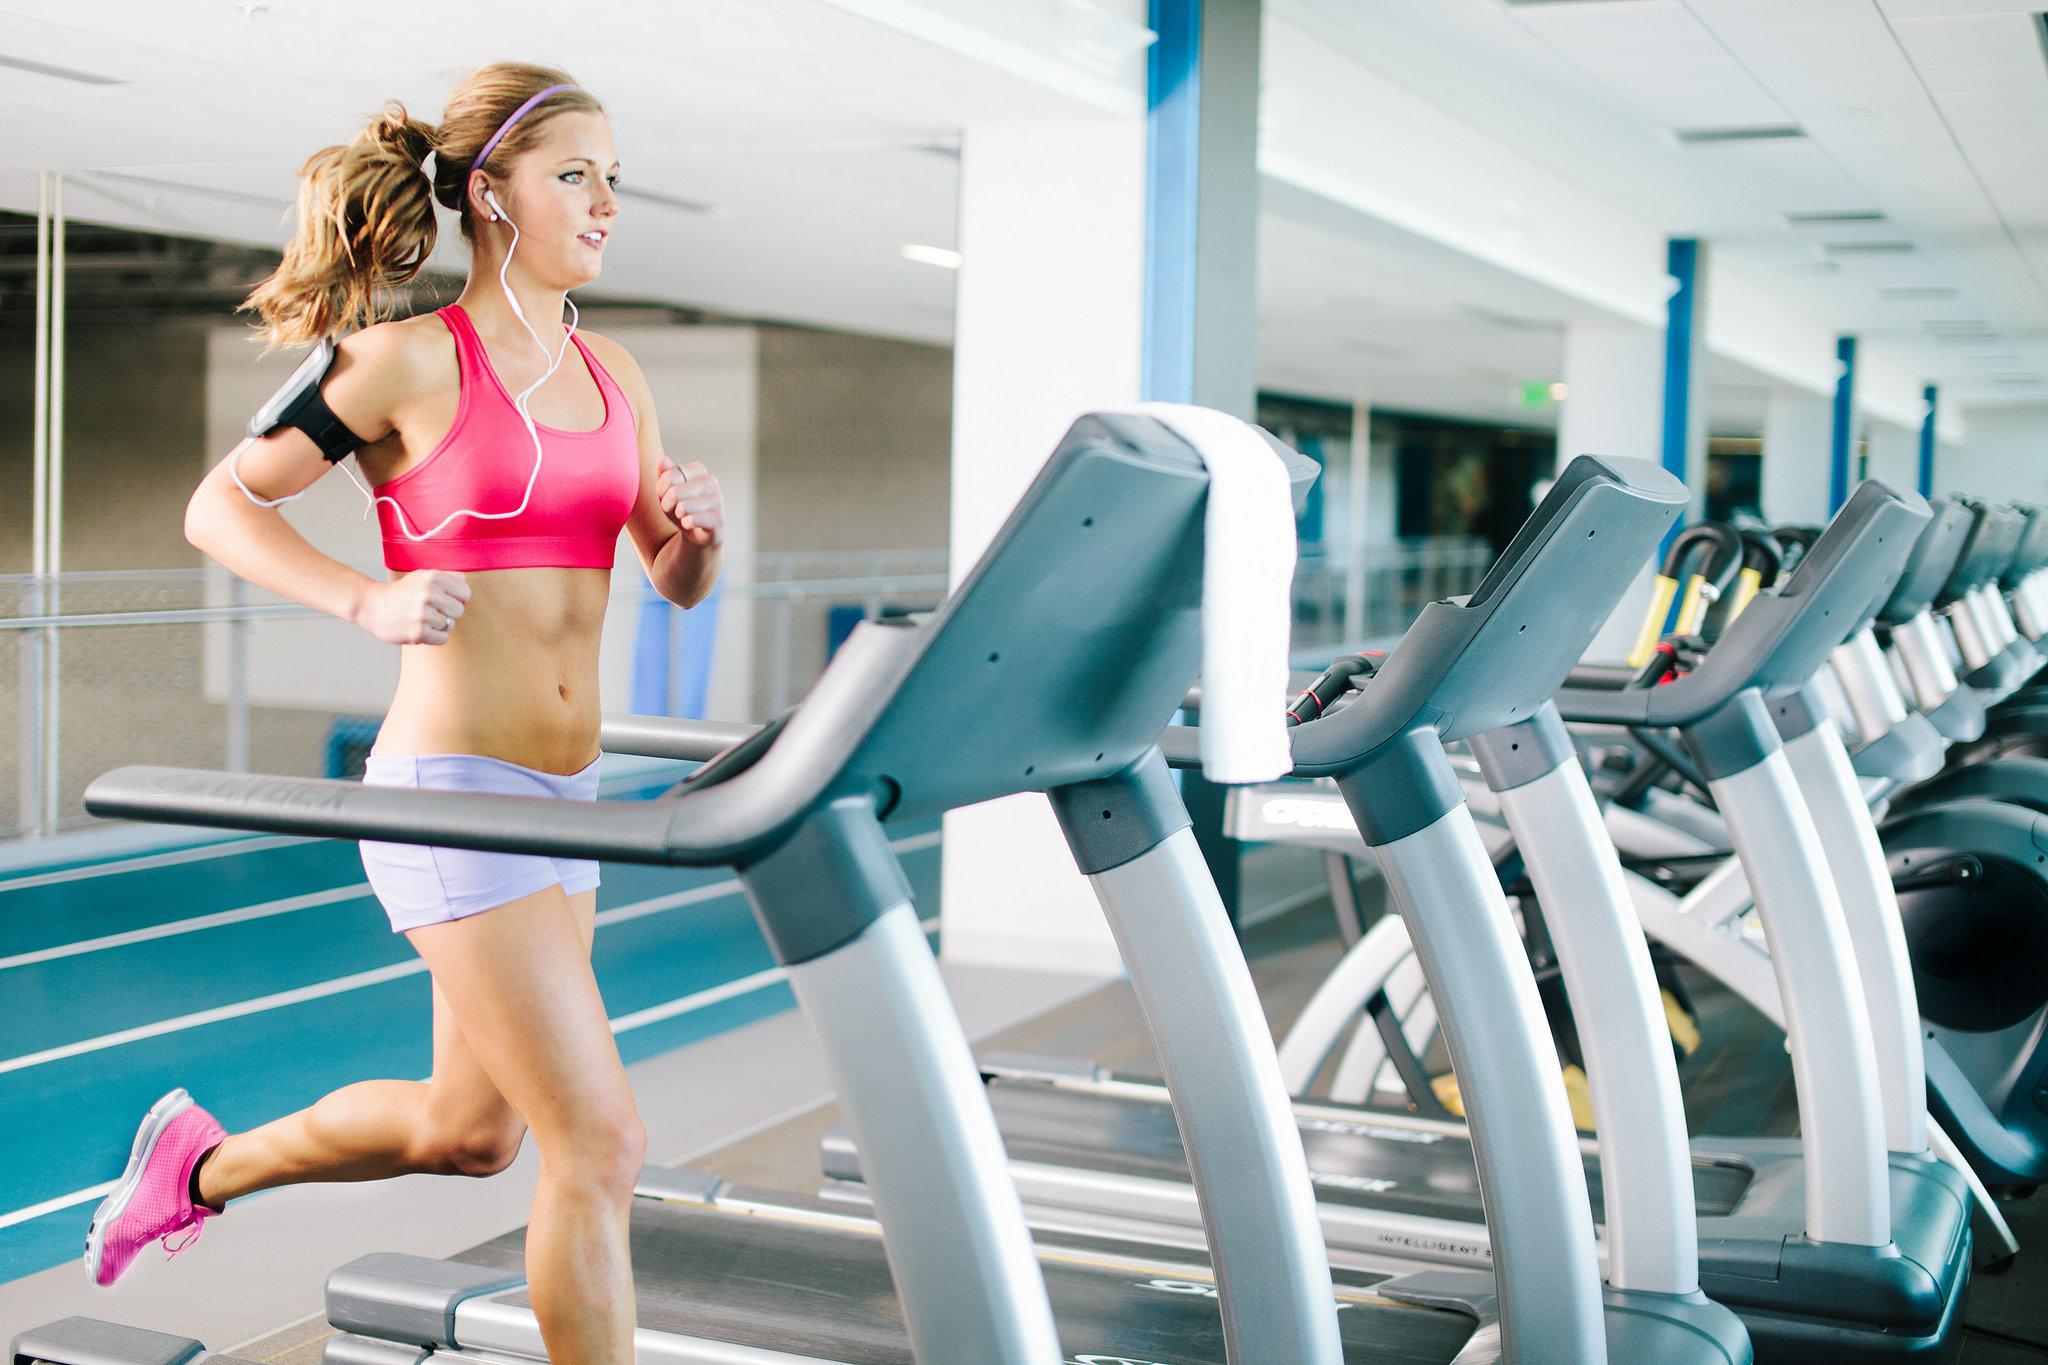 bikini prep: quick cardio shred with arm workout